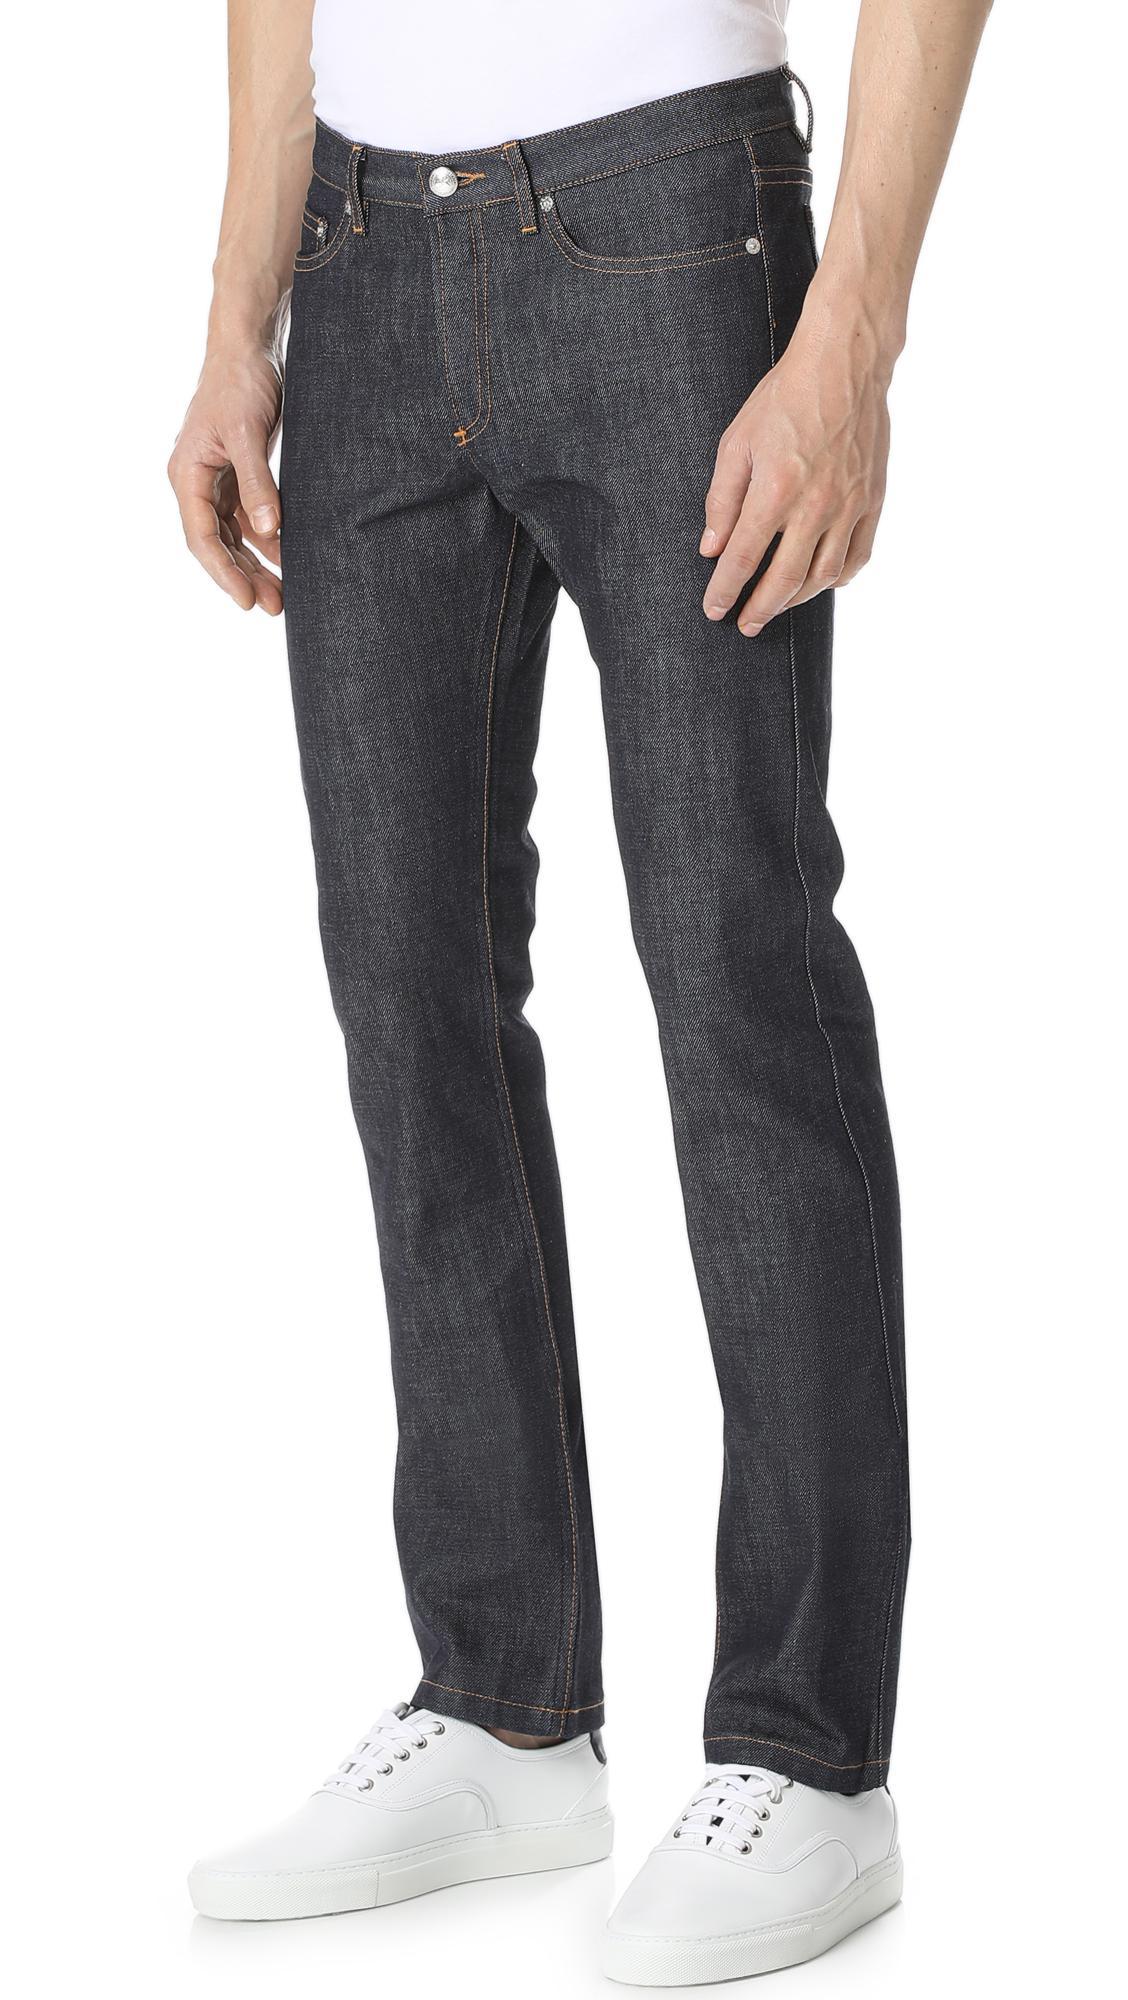 A.P.C. Denim New Cure Indigo Jeans in Blue for Men